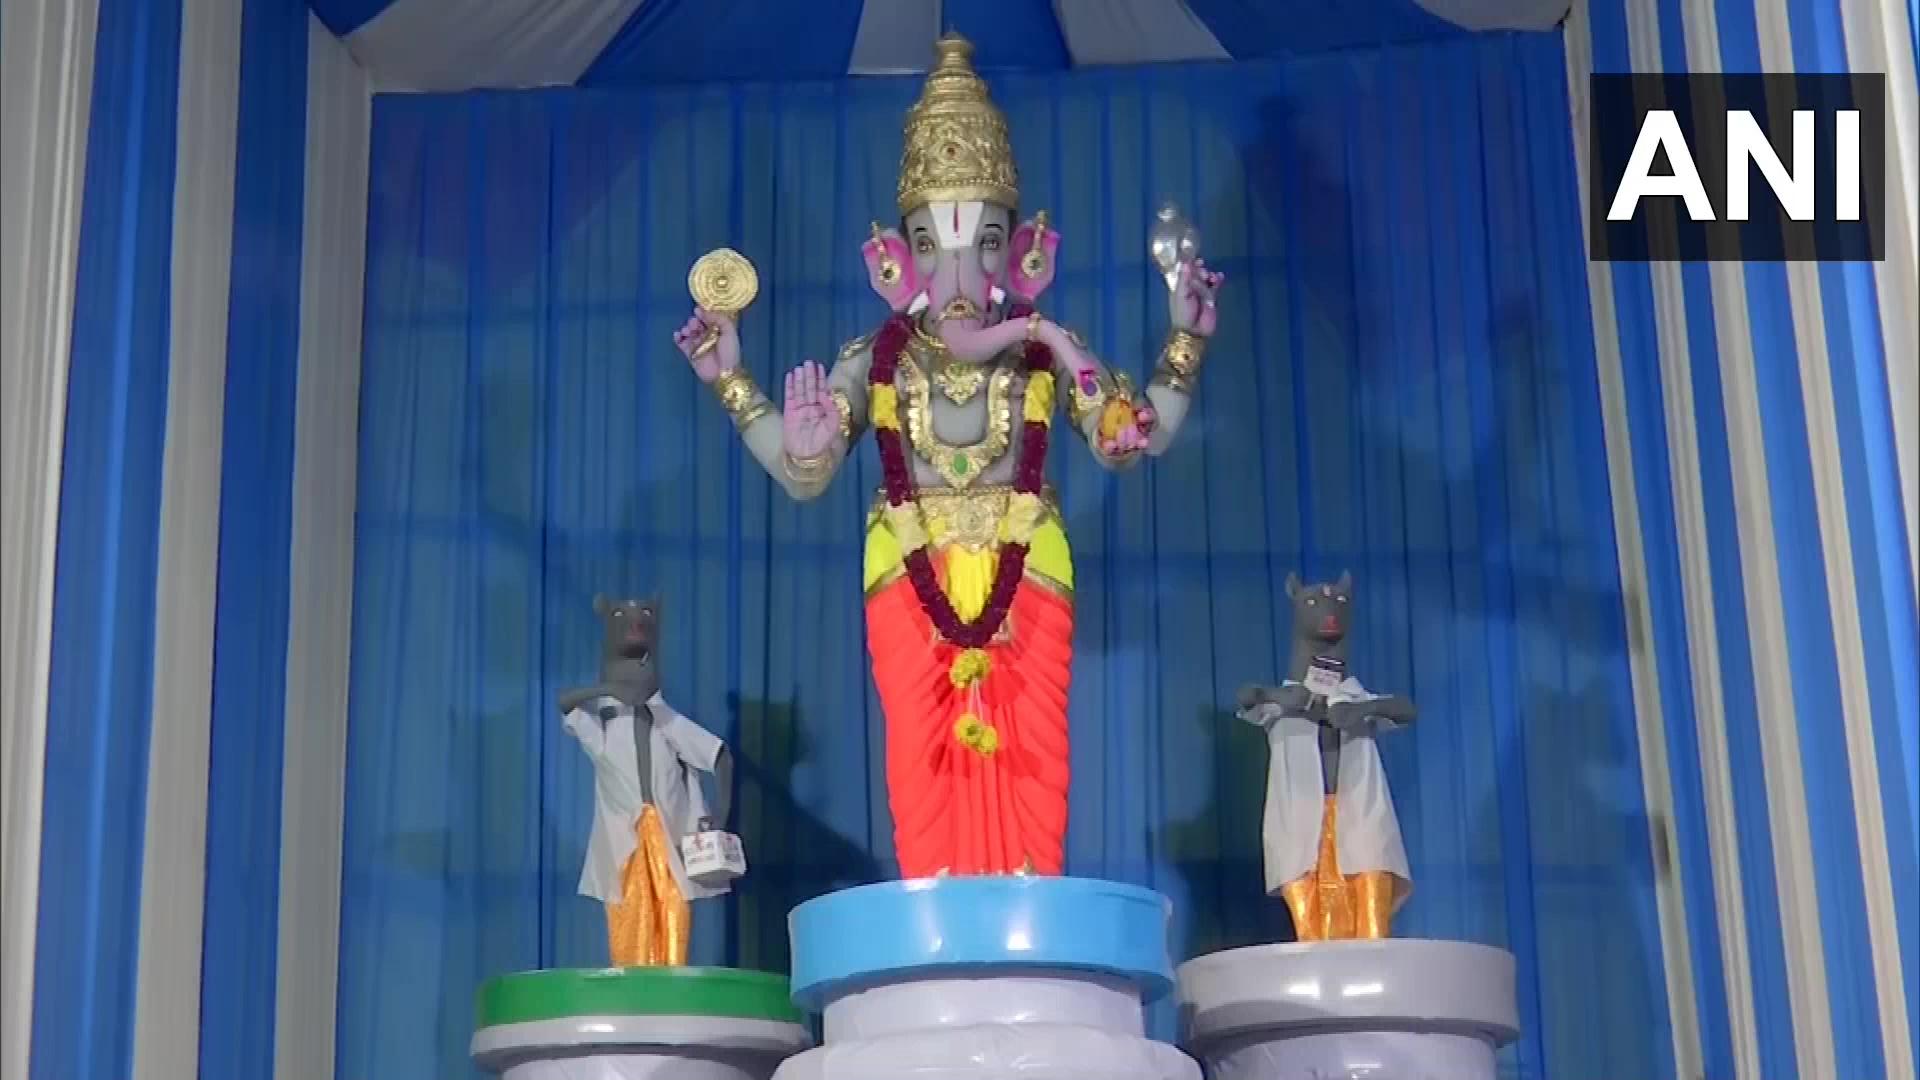 Ganesh Pandal in Hyderabad